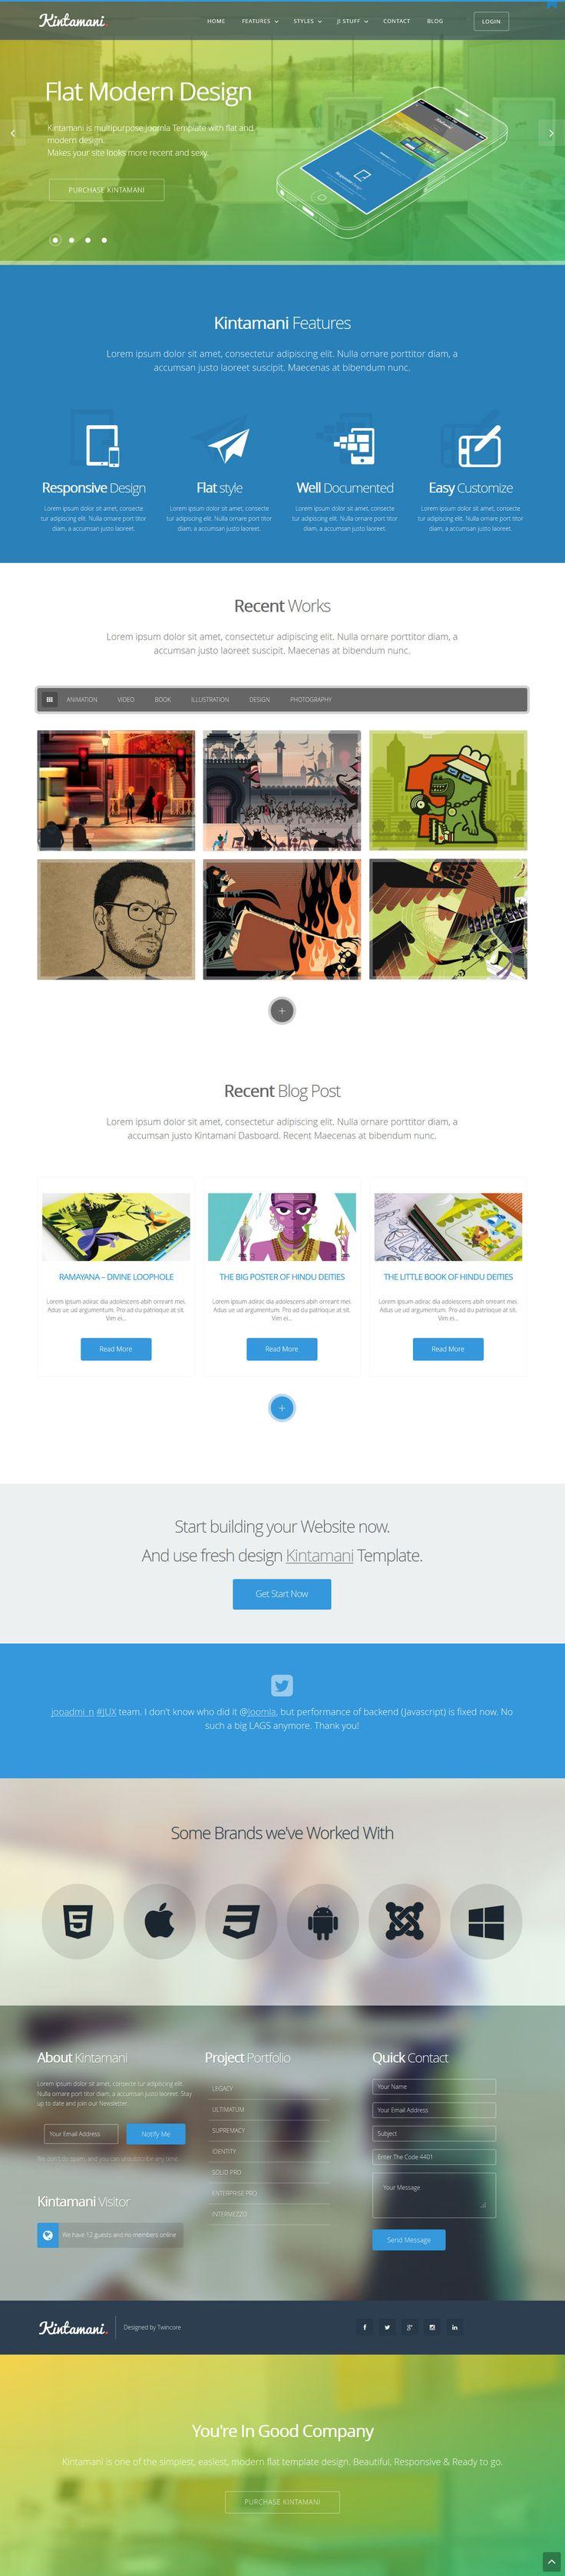 Kintamani - Responsive Multi-Purpose Joomla Theme http://themeforest.net/item/kintamani-responsive-multipurpose-joomla-theme/5855014?ref=wpaw #web #design #joomla